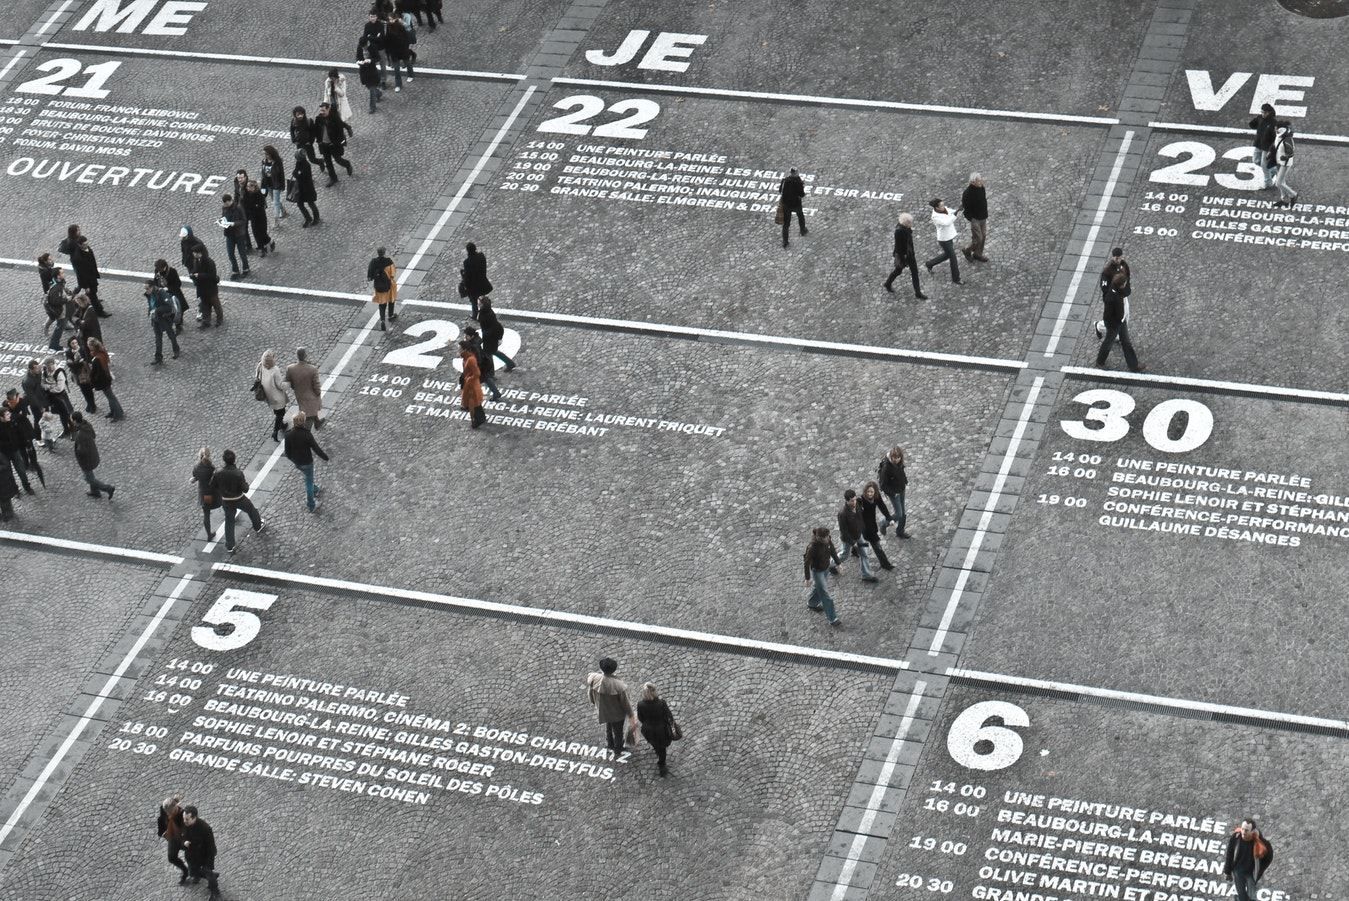 Aerial shot of people walking across a street that looks like a calendar